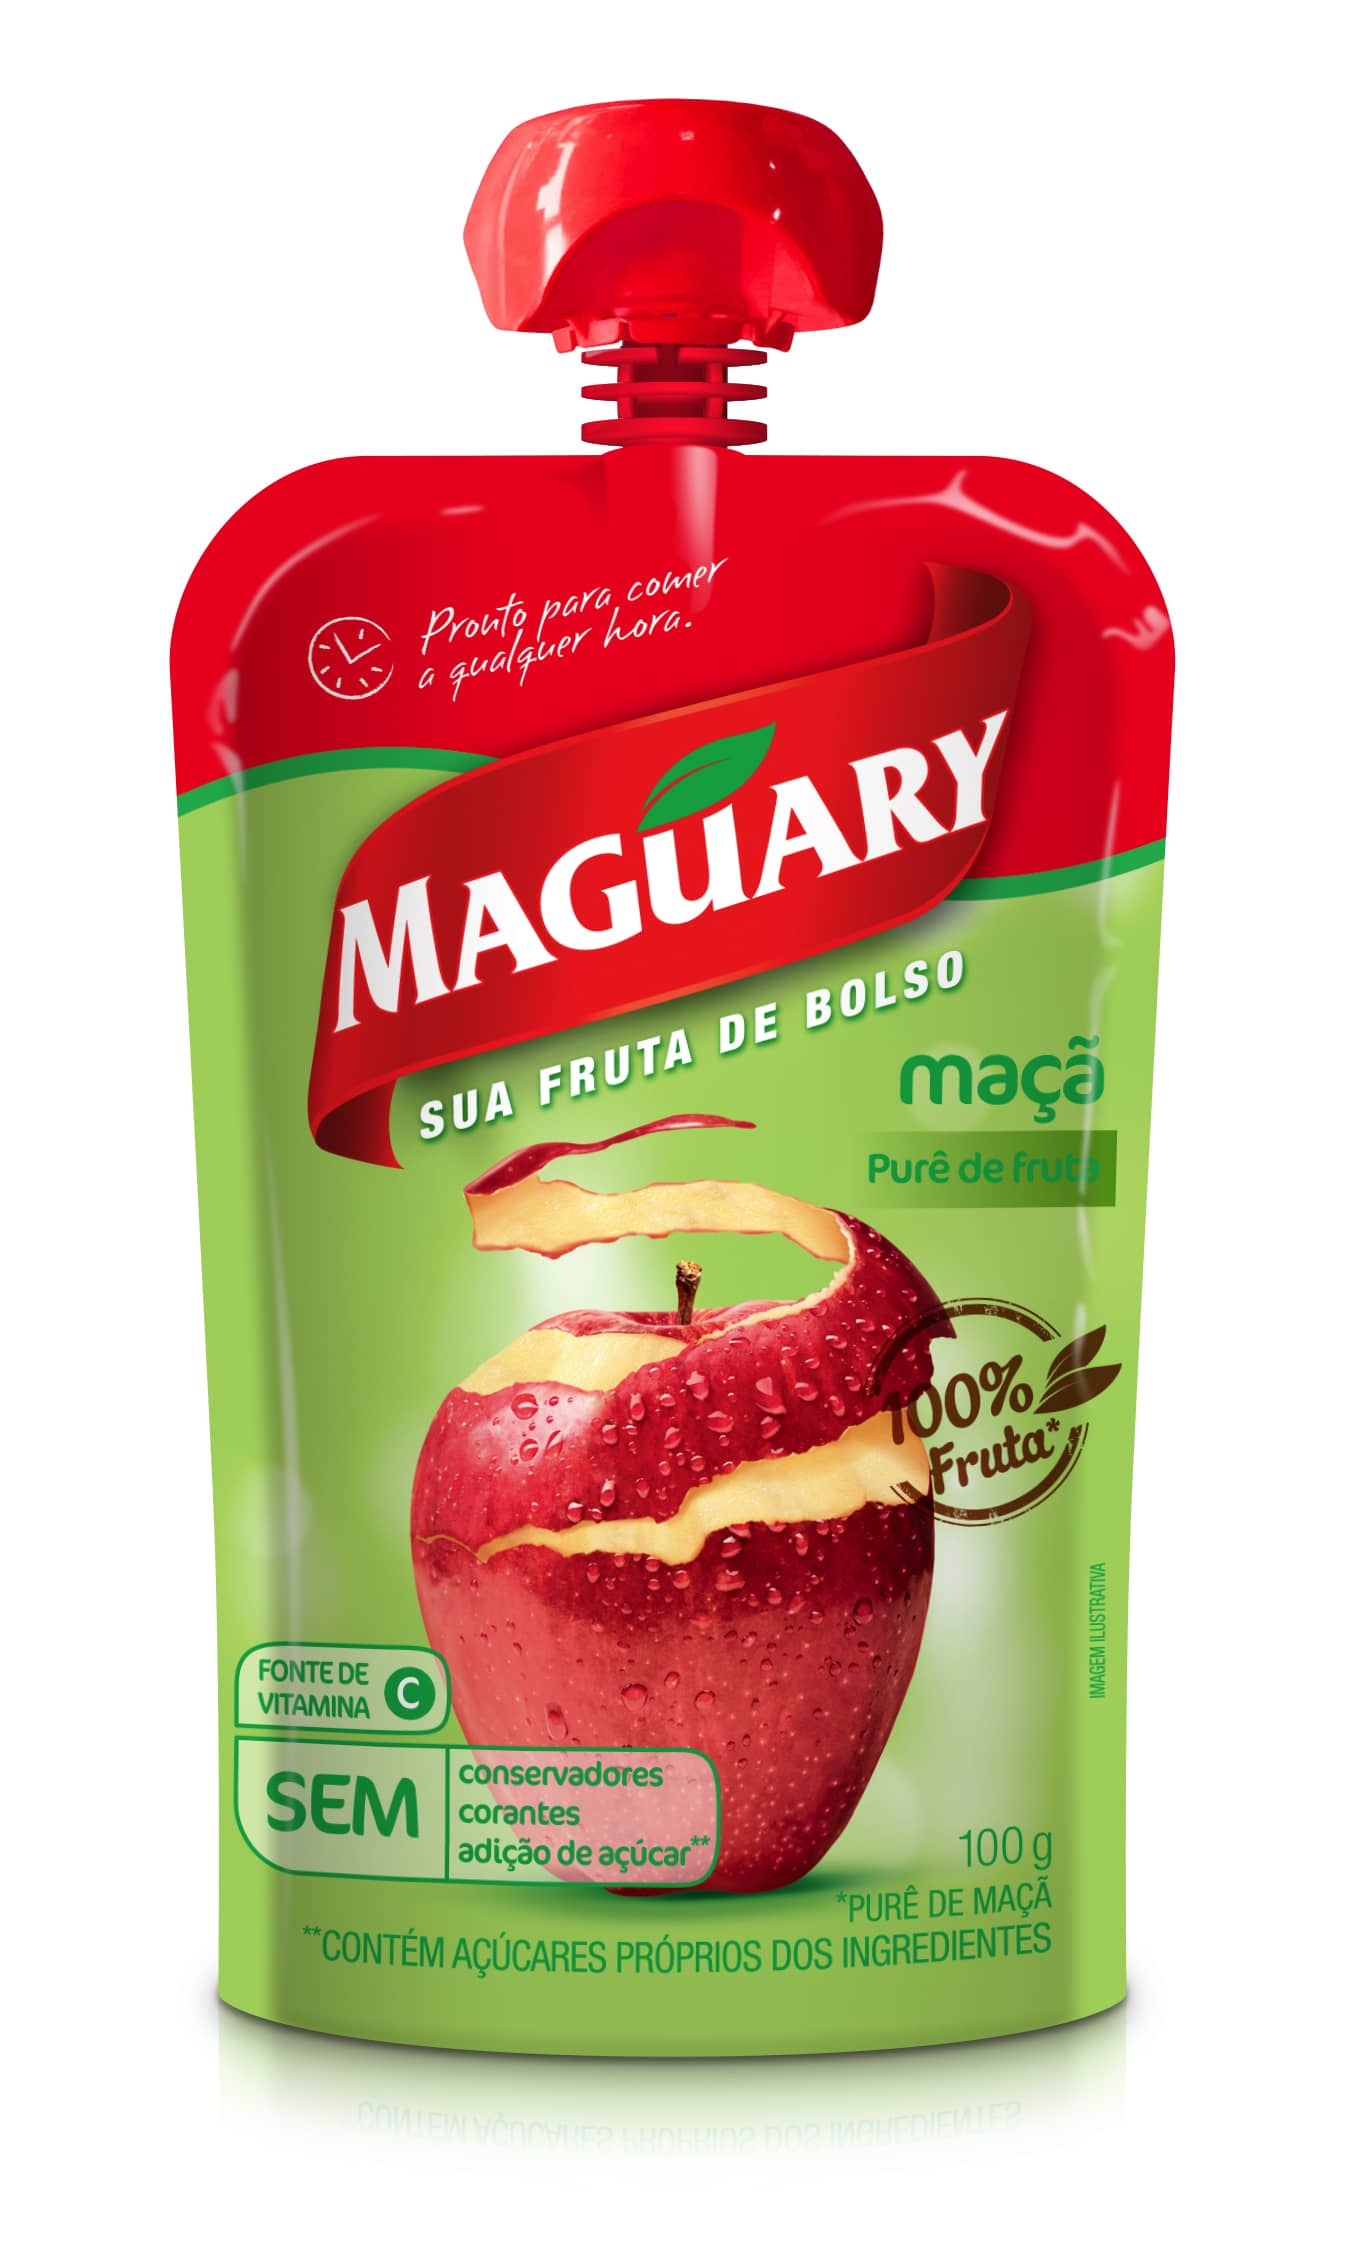 AF_Maguary_Mockup_Pure_Maca_140813